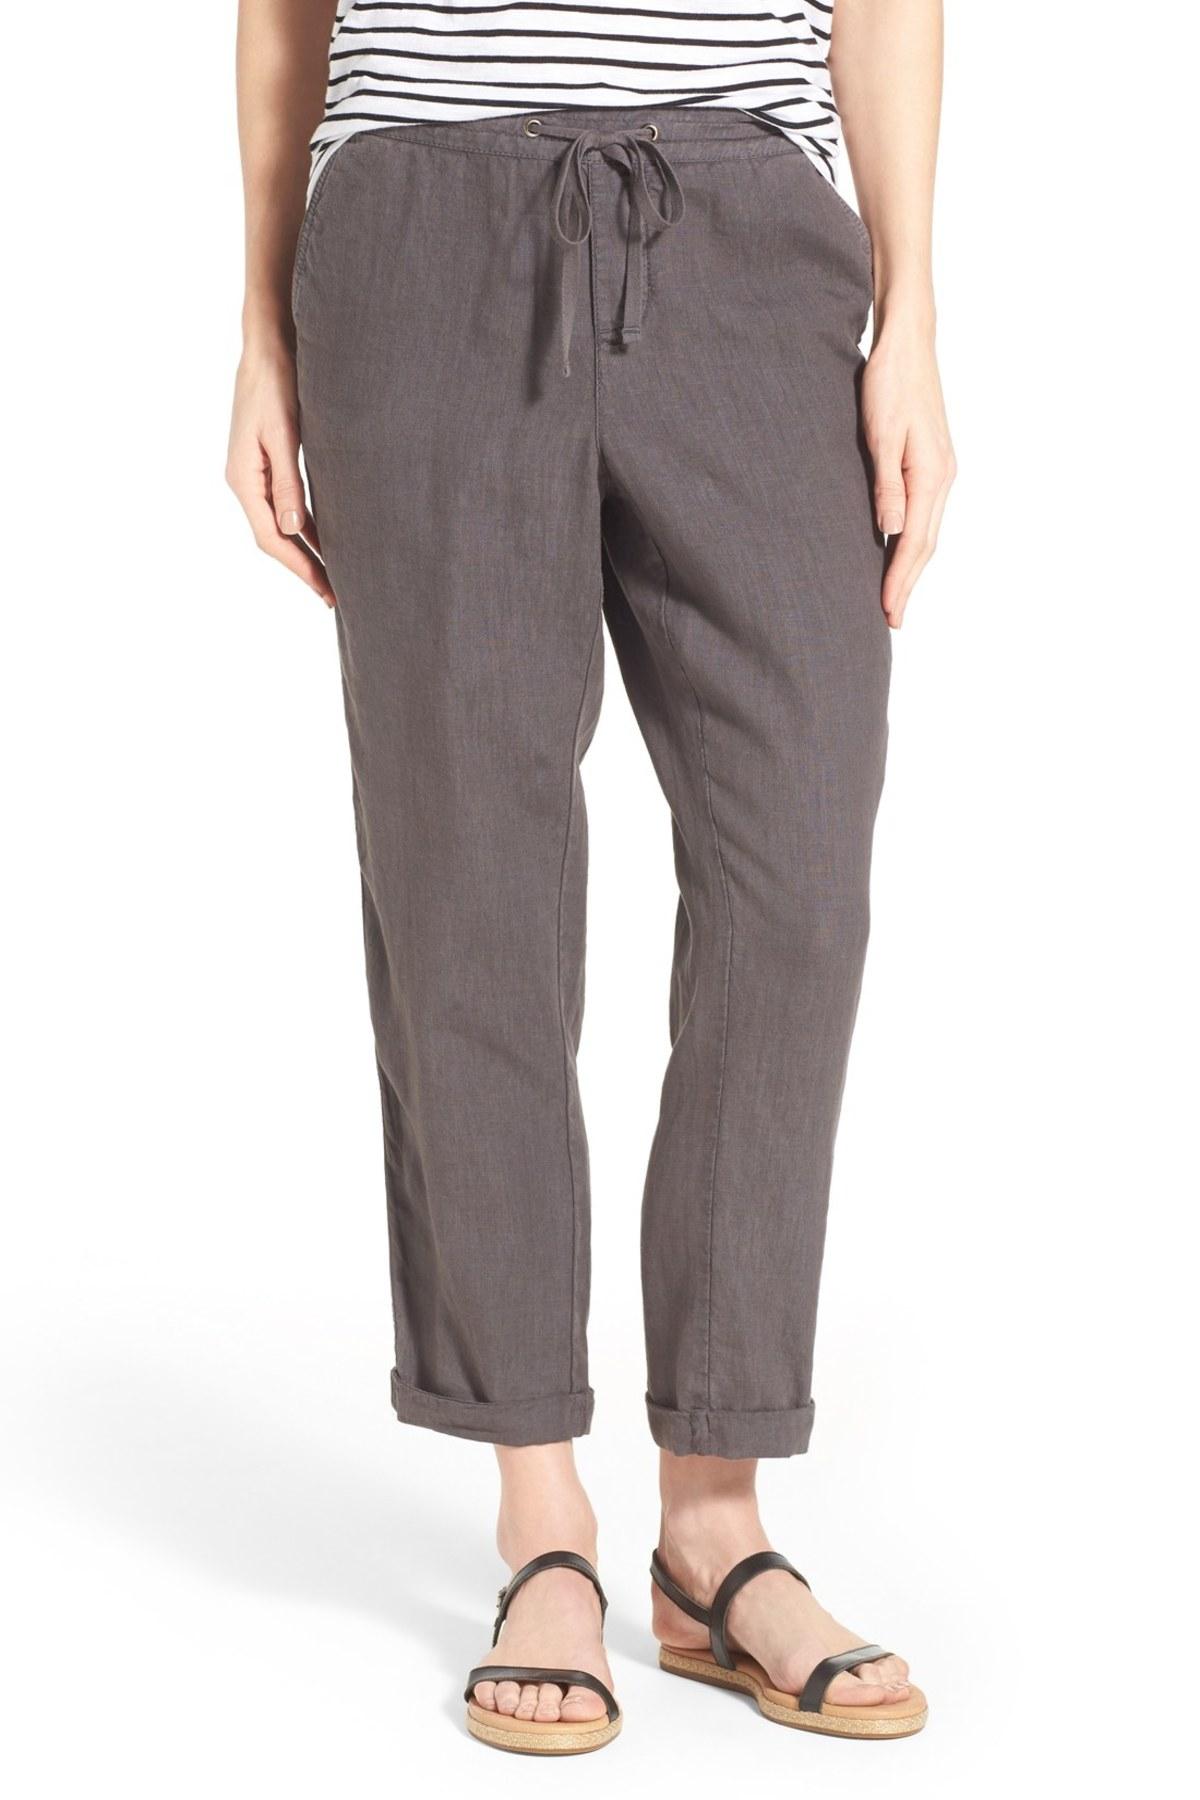 Lastest Grey Linen Pants Womens | Pant So